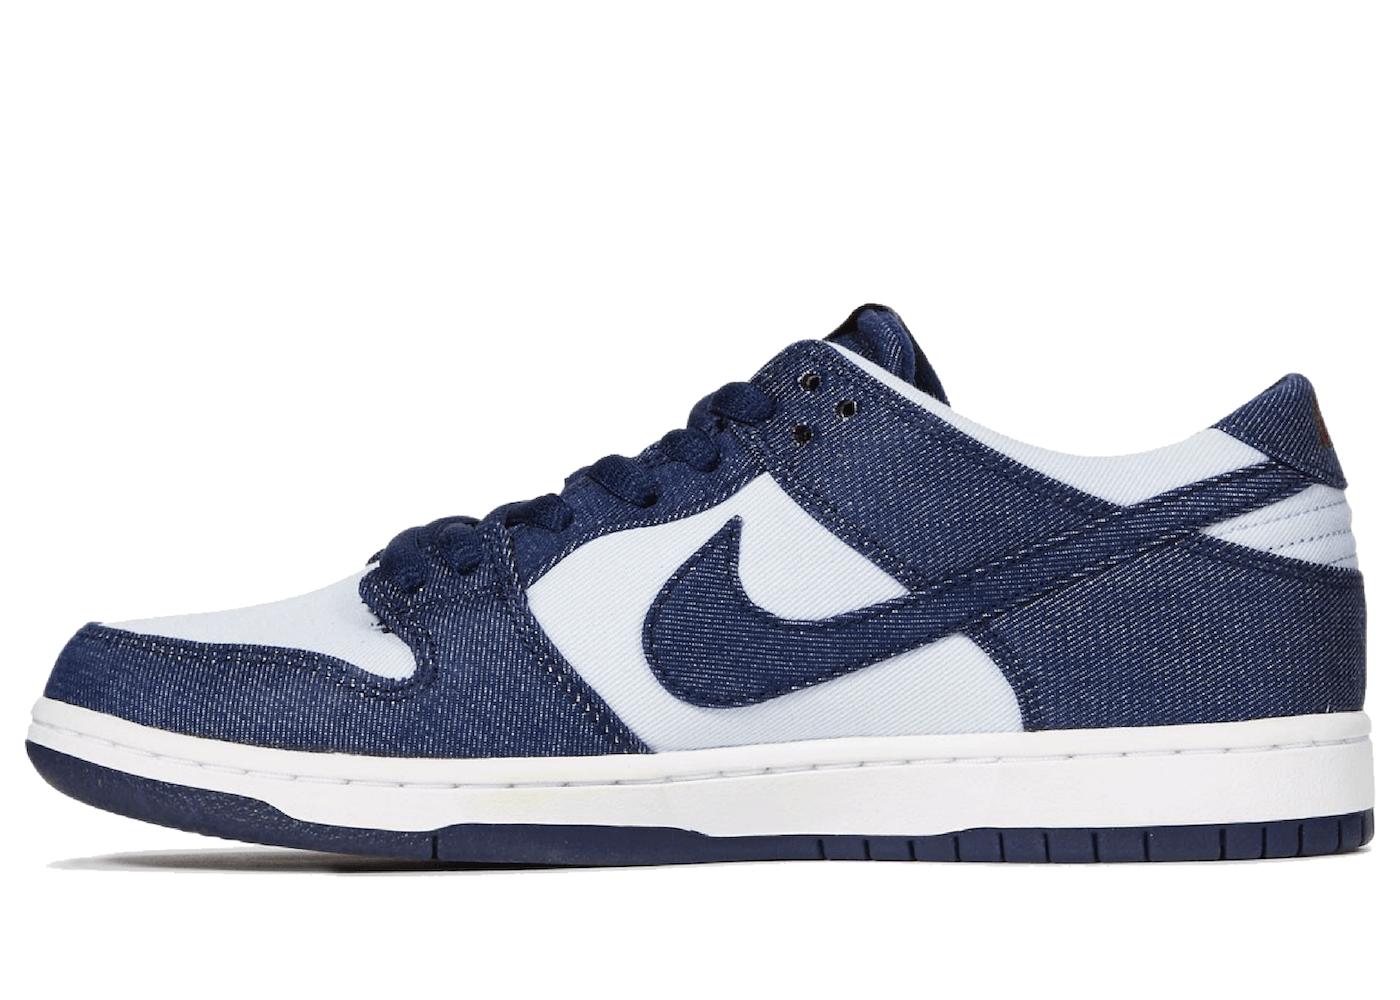 Nike SB Dunk Low Binary Blueの写真